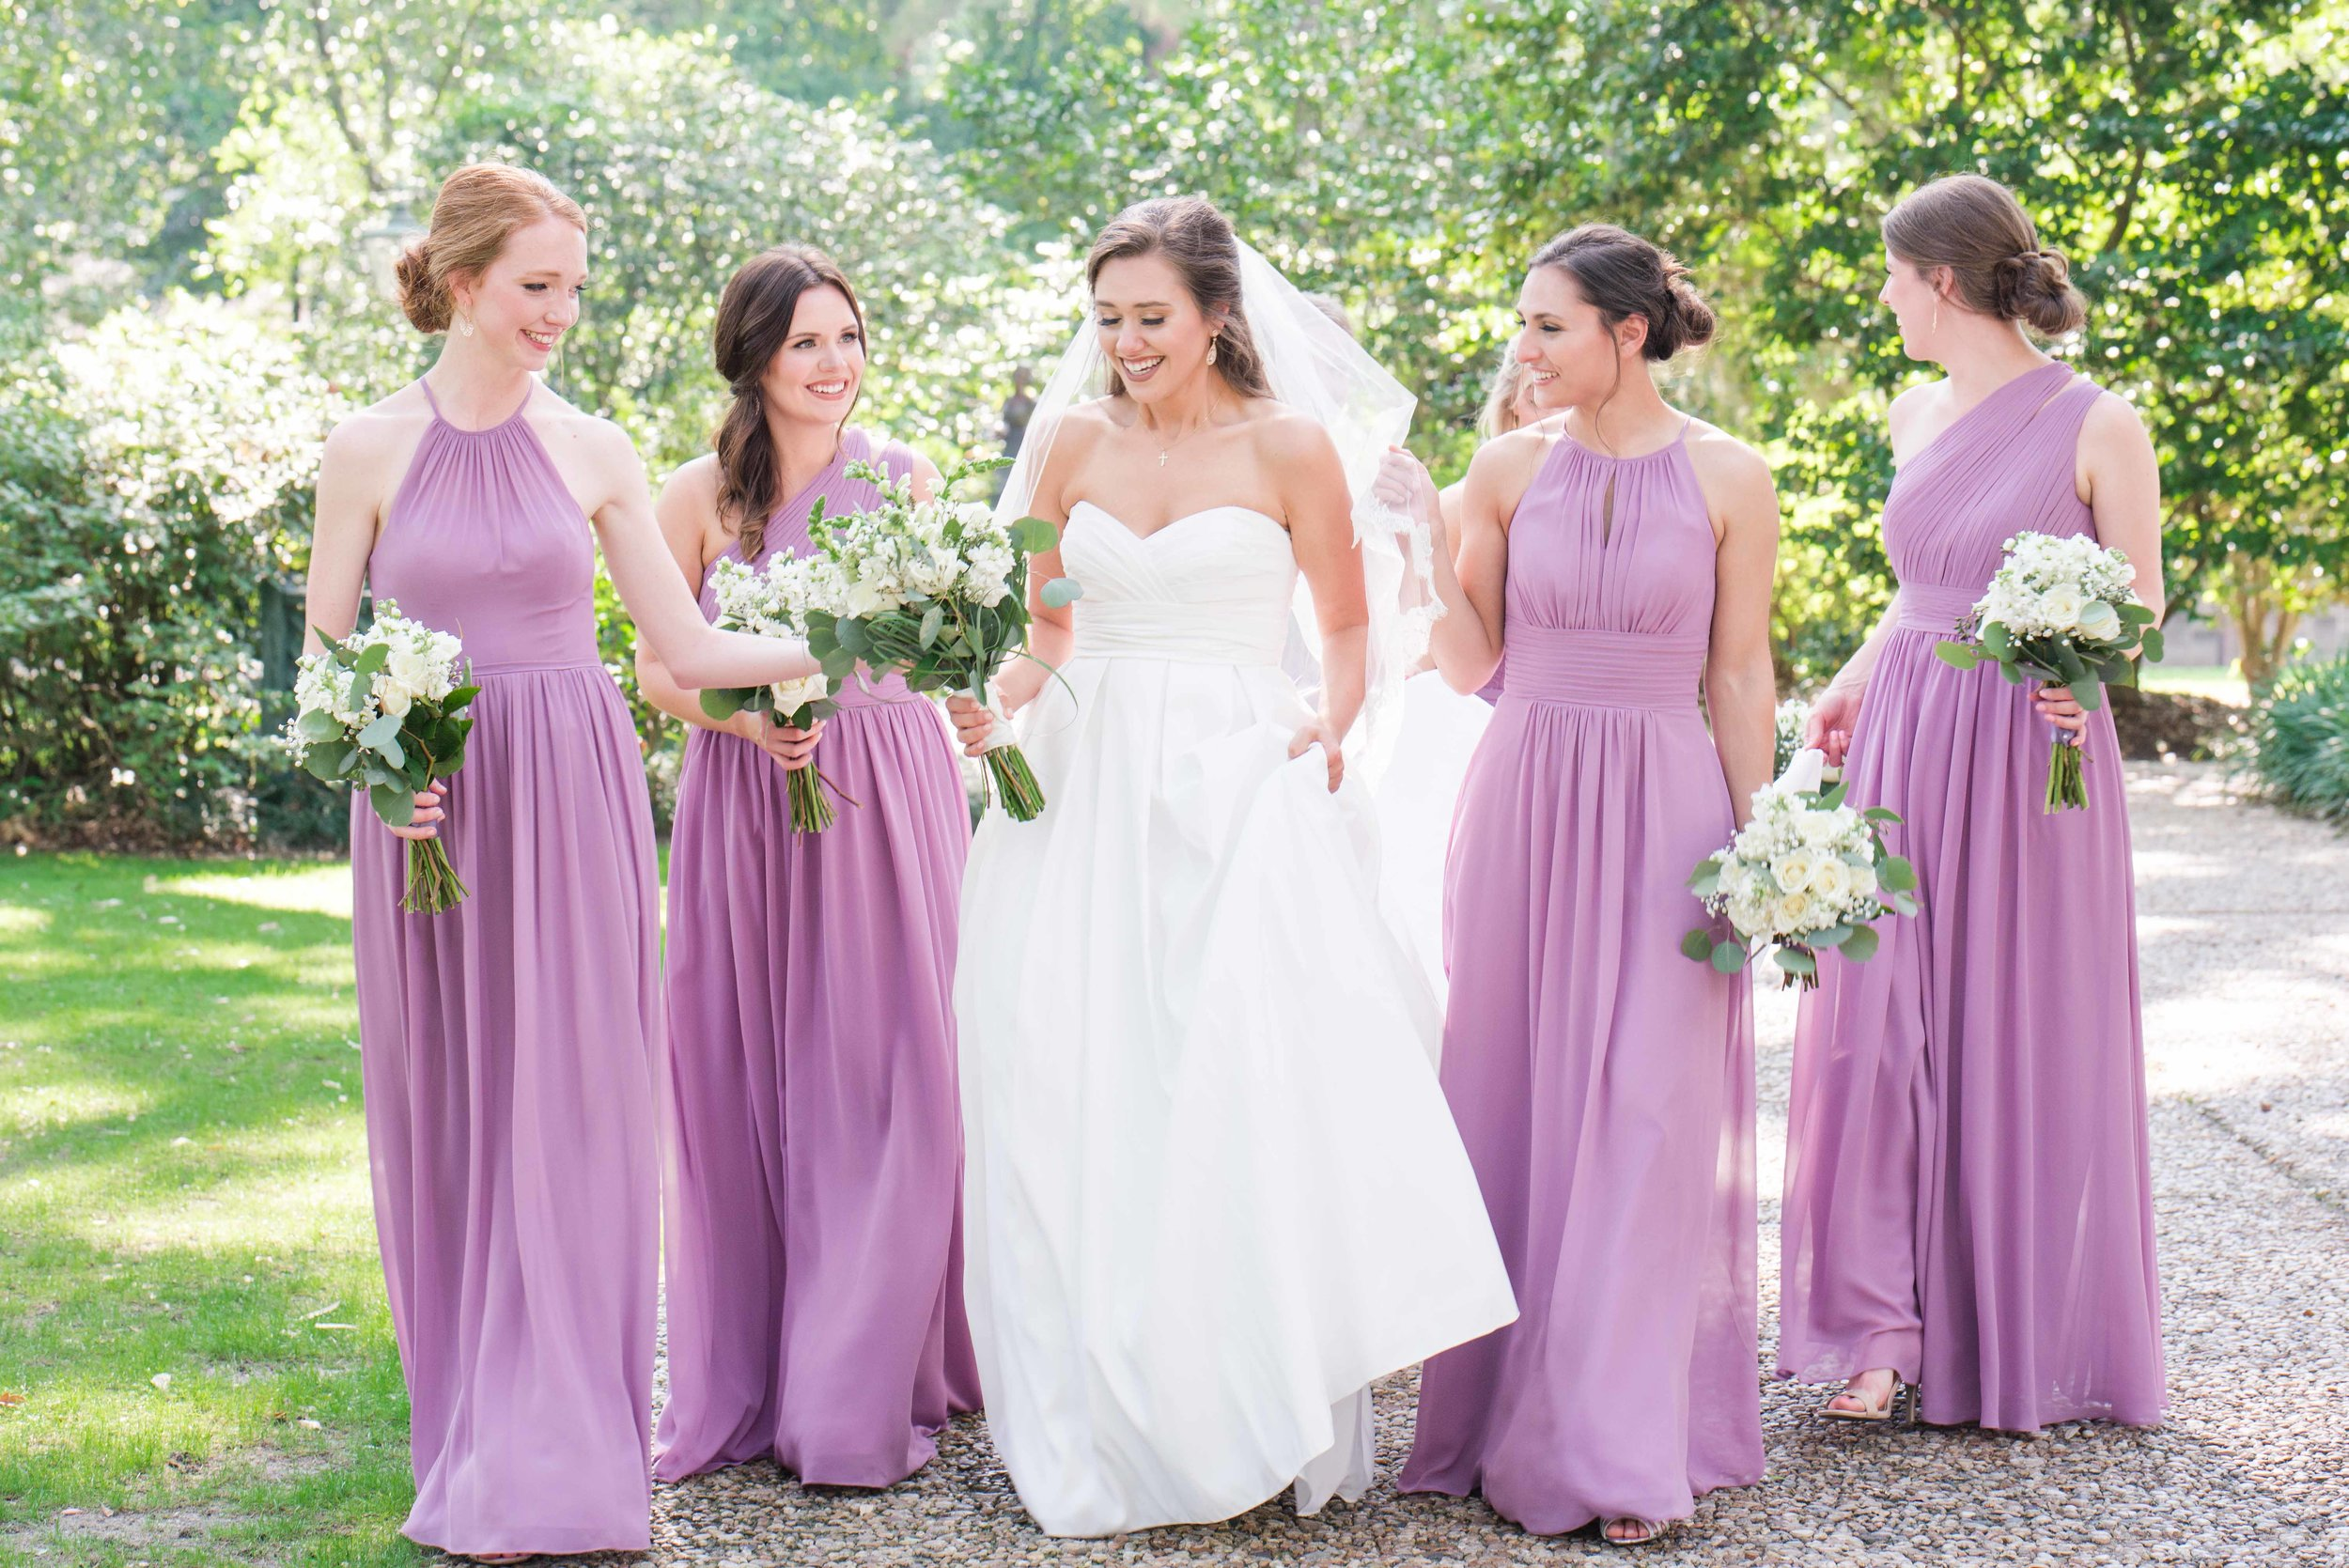 Bragg-Mitchell Mansion Mobile Alabama Wedding Bridesmaids Deborah Michelle Photography